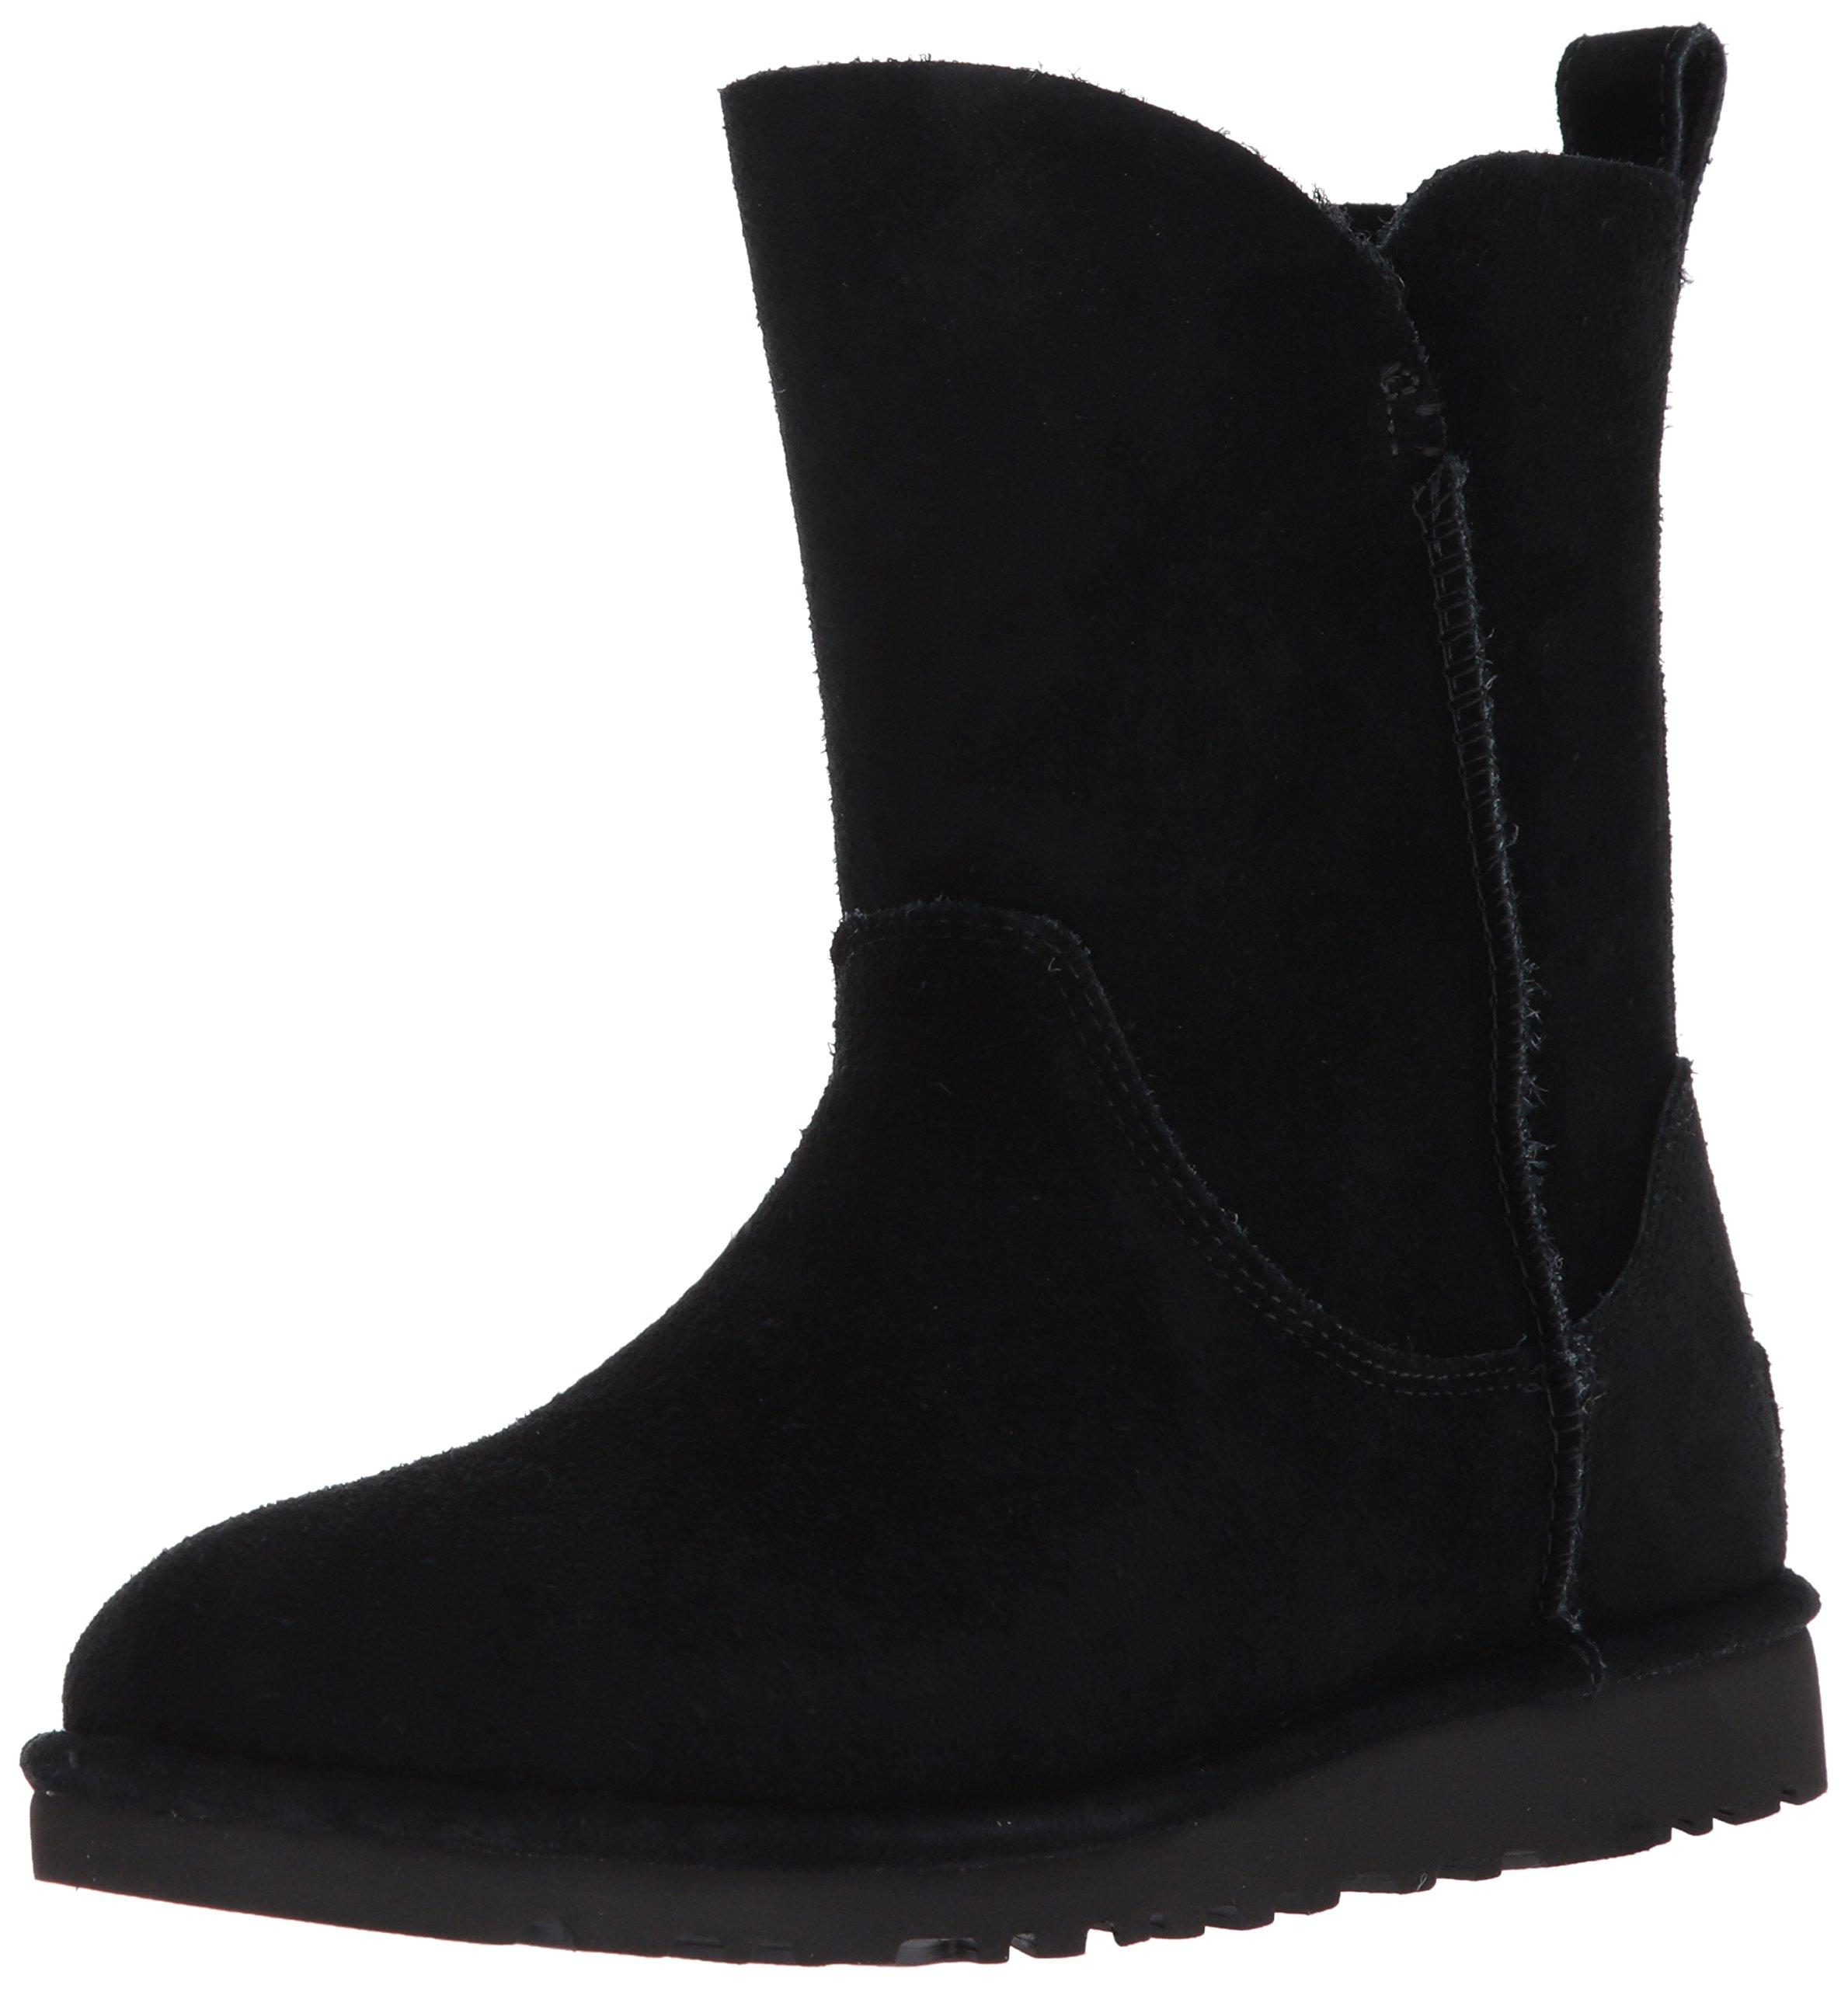 UGG Women's Alida Slouch Boot, Black, 9 M US